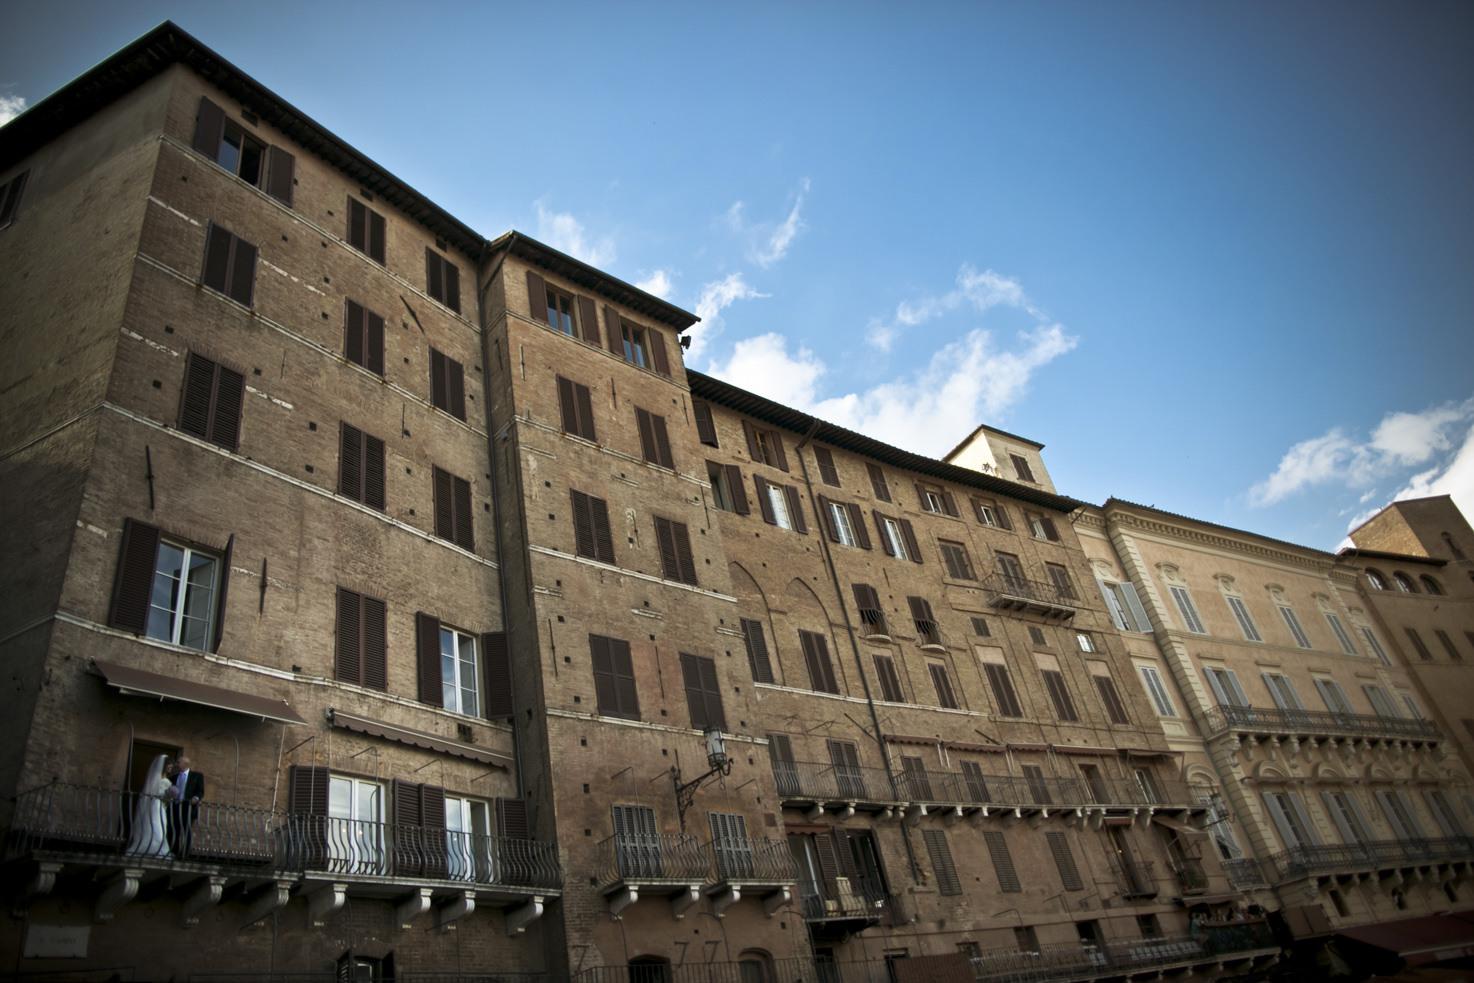 Ancient palaces in Piazza del Campo, Siena